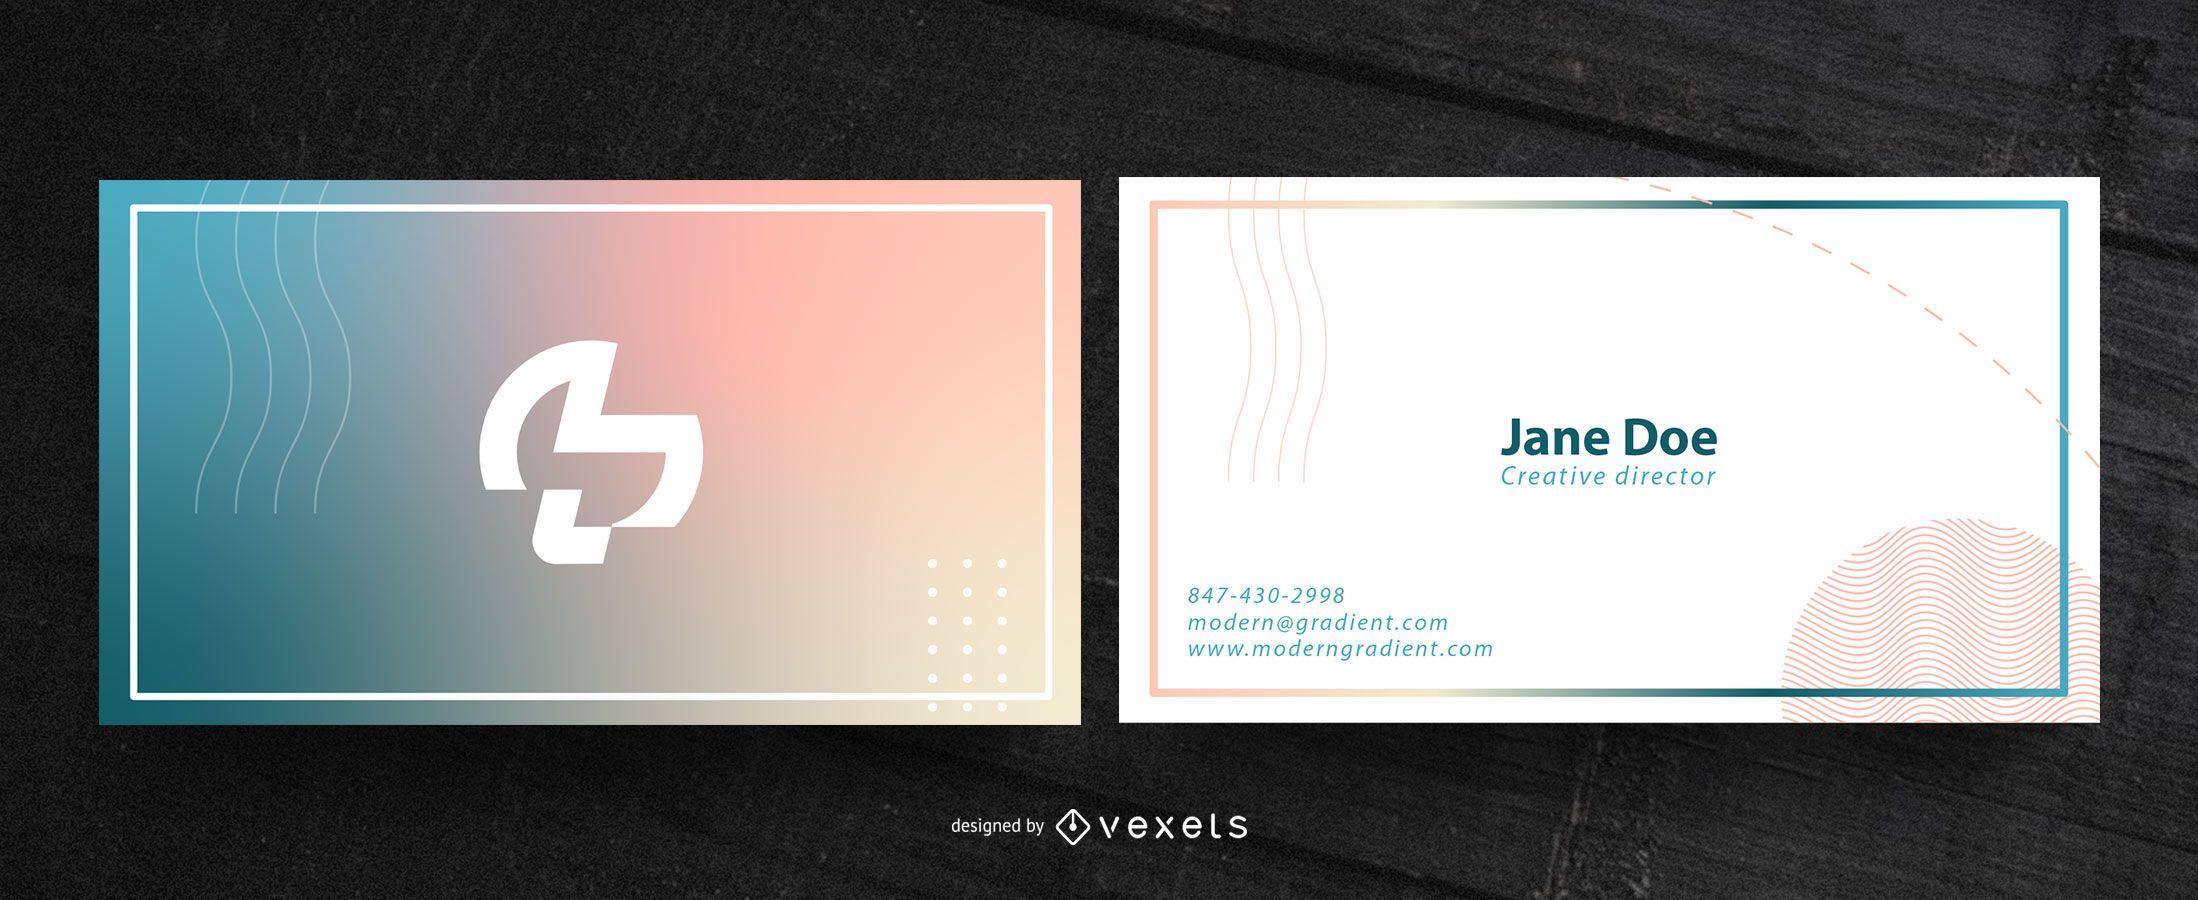 Gradient business card design